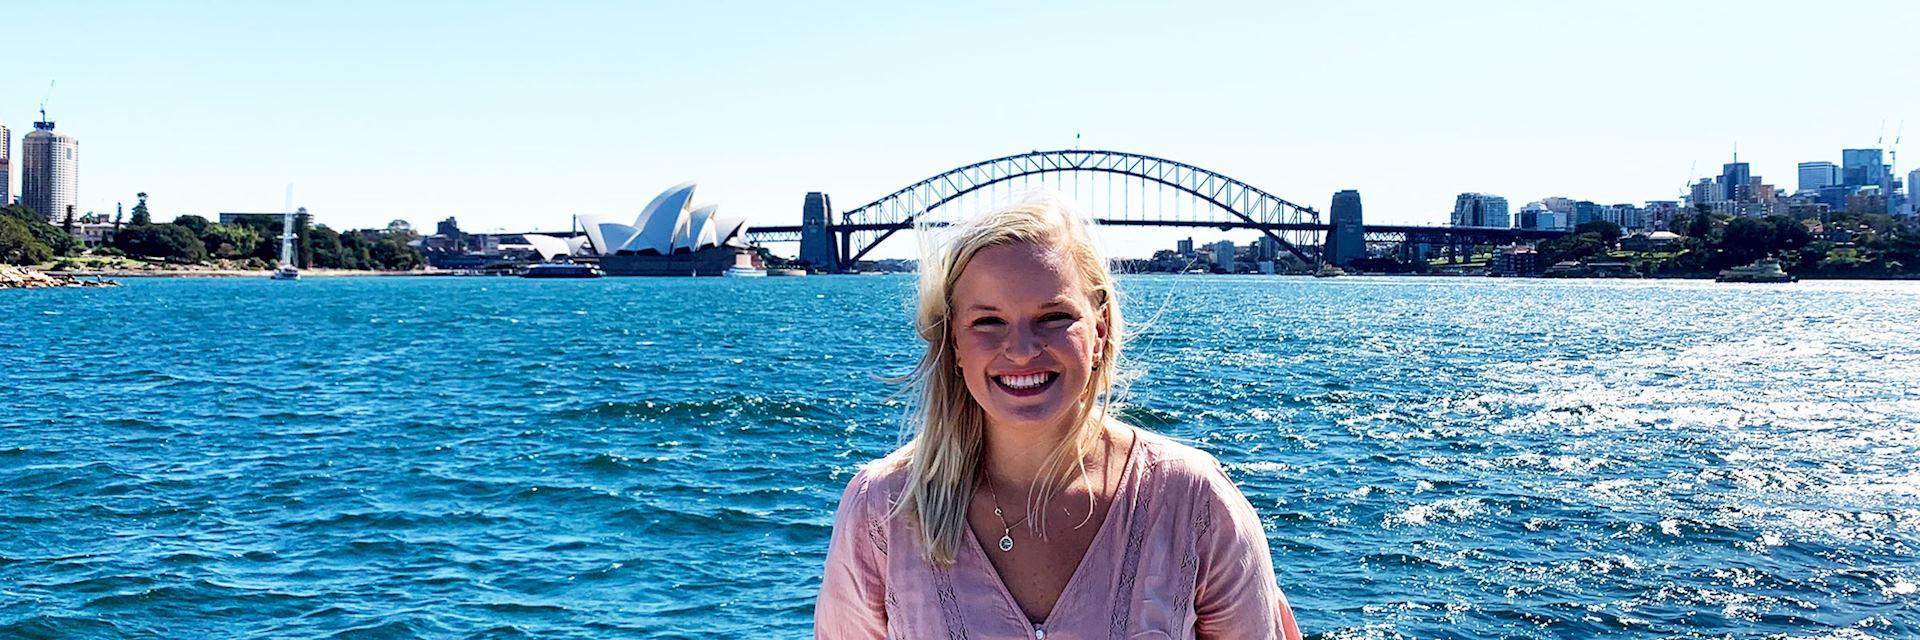 Lauren at Sydney Harbour